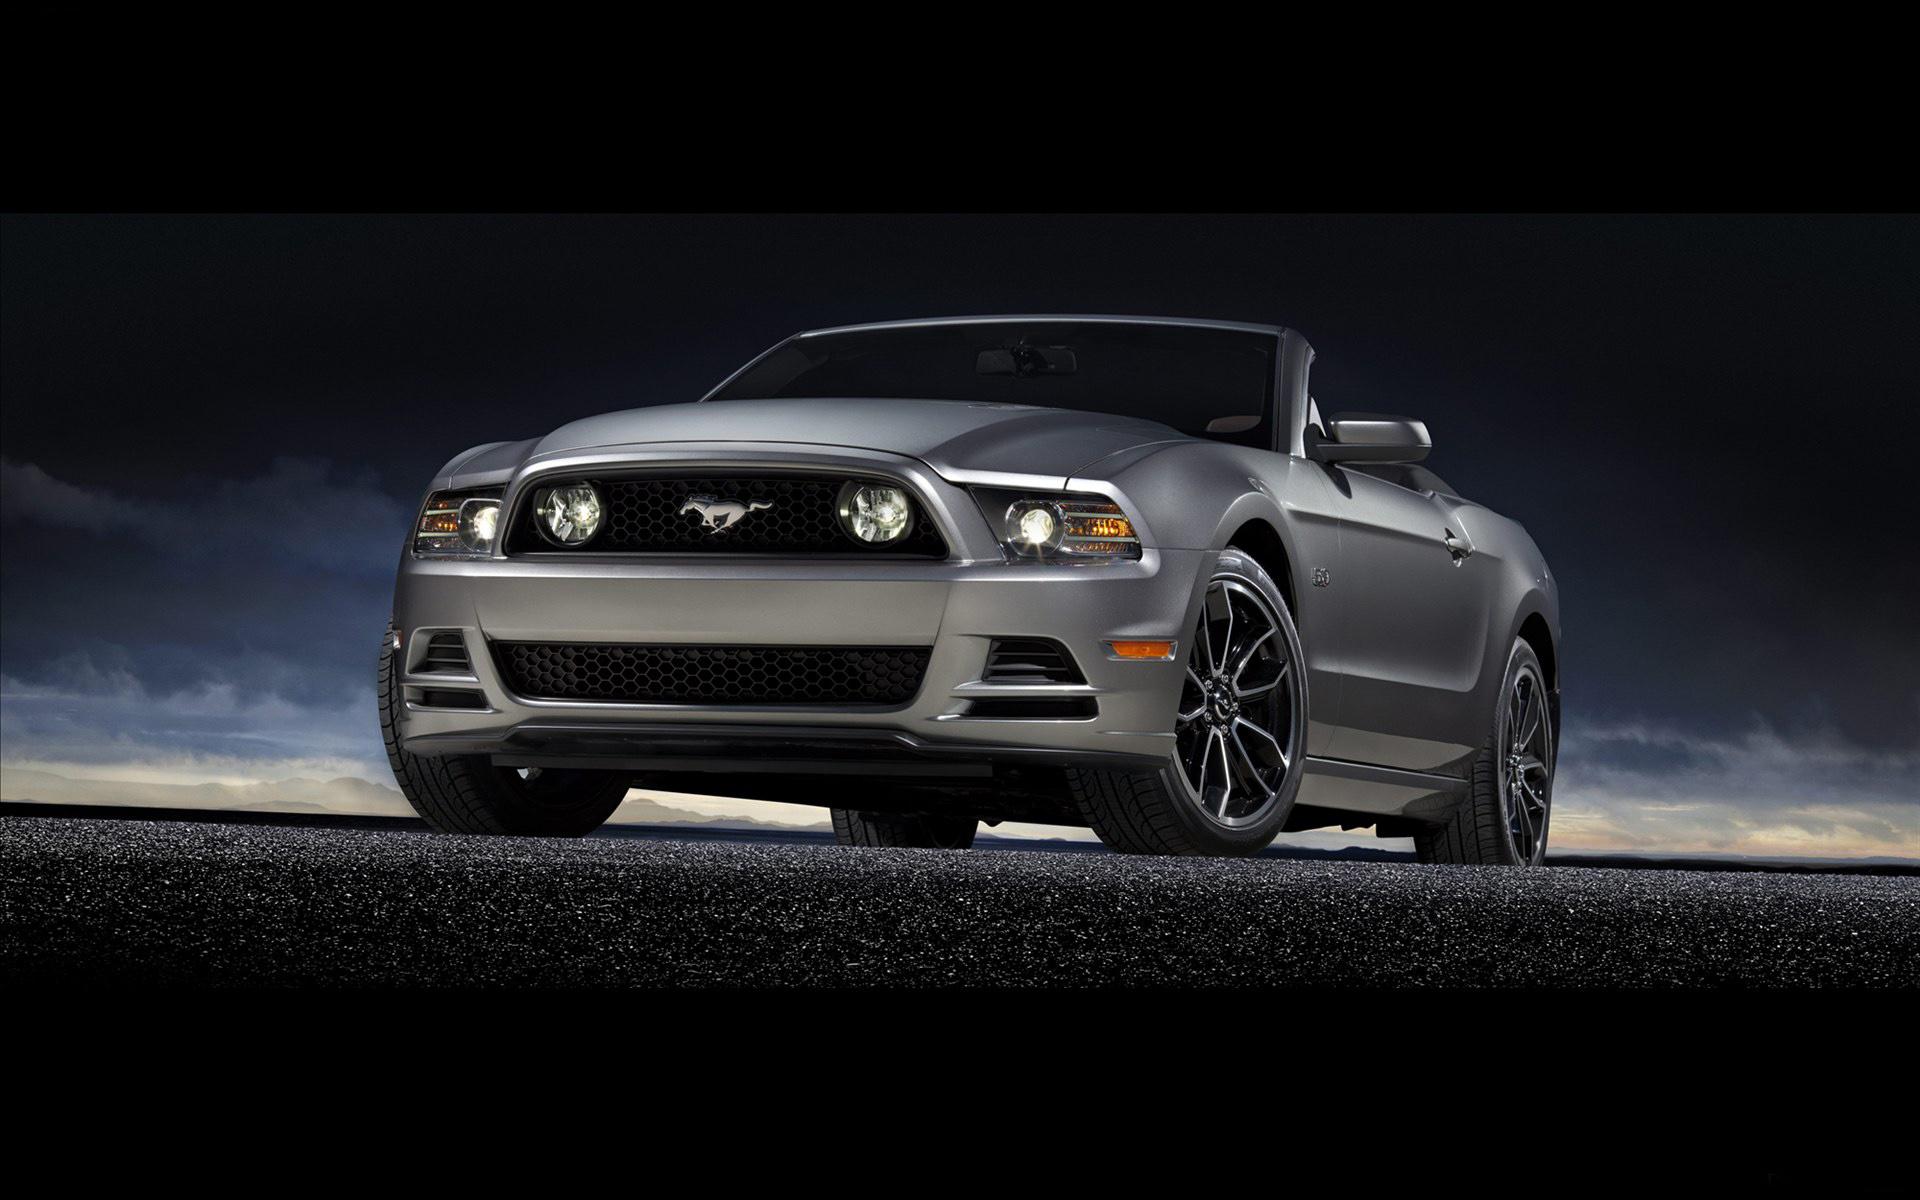 Ford Mustang GT 2013 Wallpaper HD Car Wallpapers 1920x1200